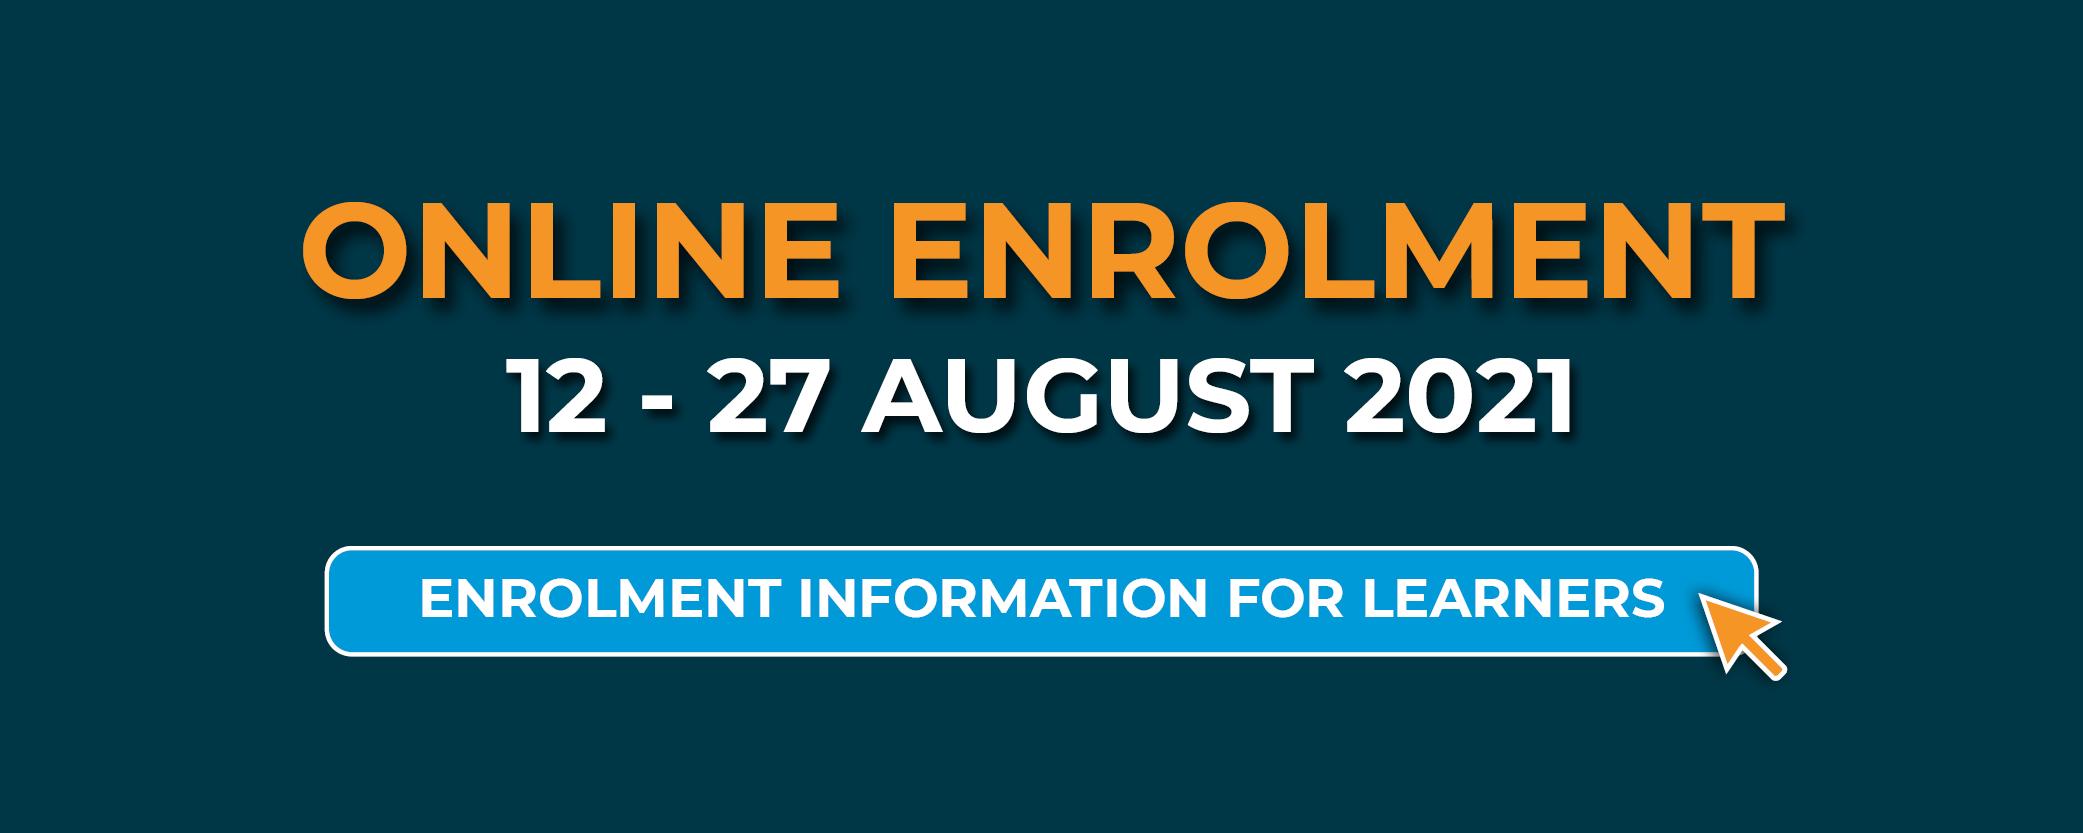 Enrolment information for learners